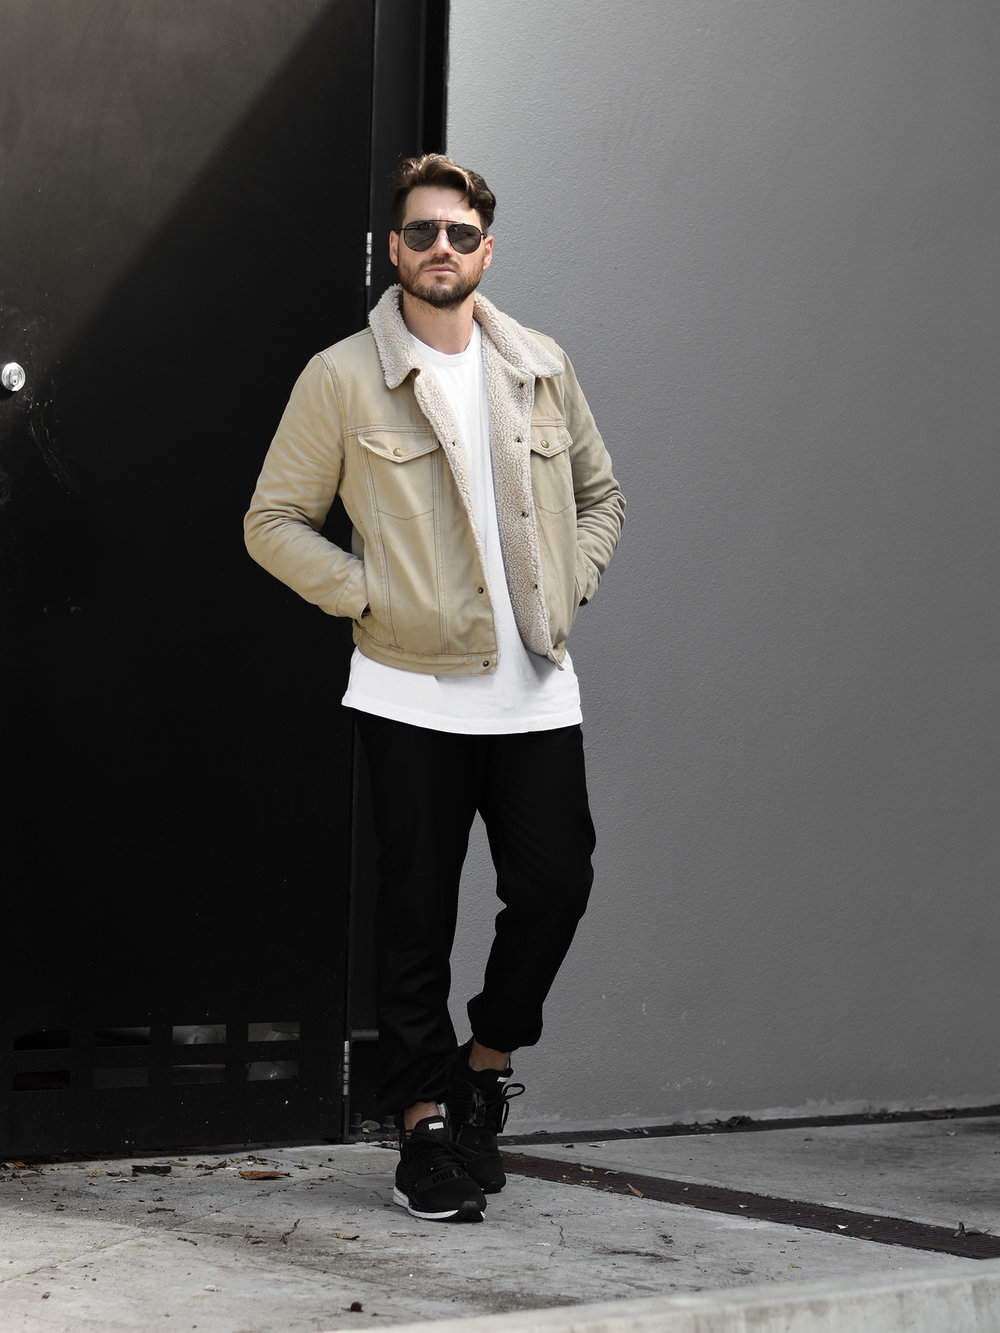 jaheb_barnett_mens_fashion_blogger_rollas_sherpa_denim_jacket_acne_studios_wool_pants_puma_ignite_sneakers_bailey_nelson